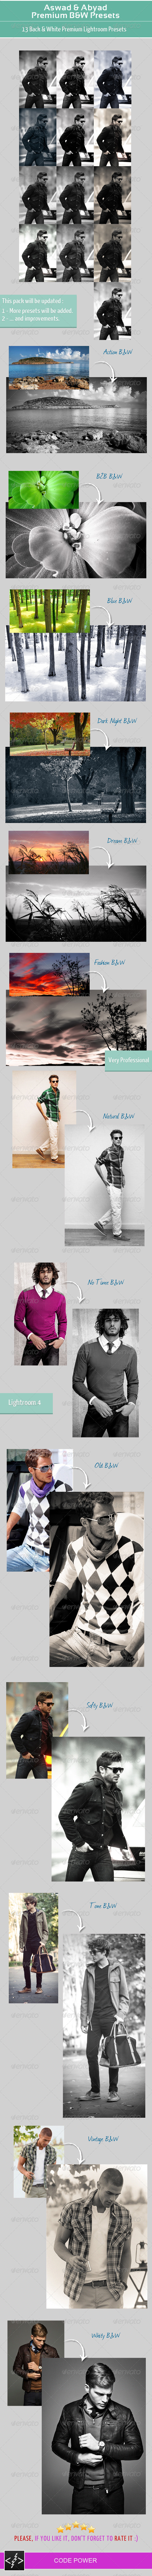 GraphicRiver Aswad & Abyad Premium B&W Presets 4736167